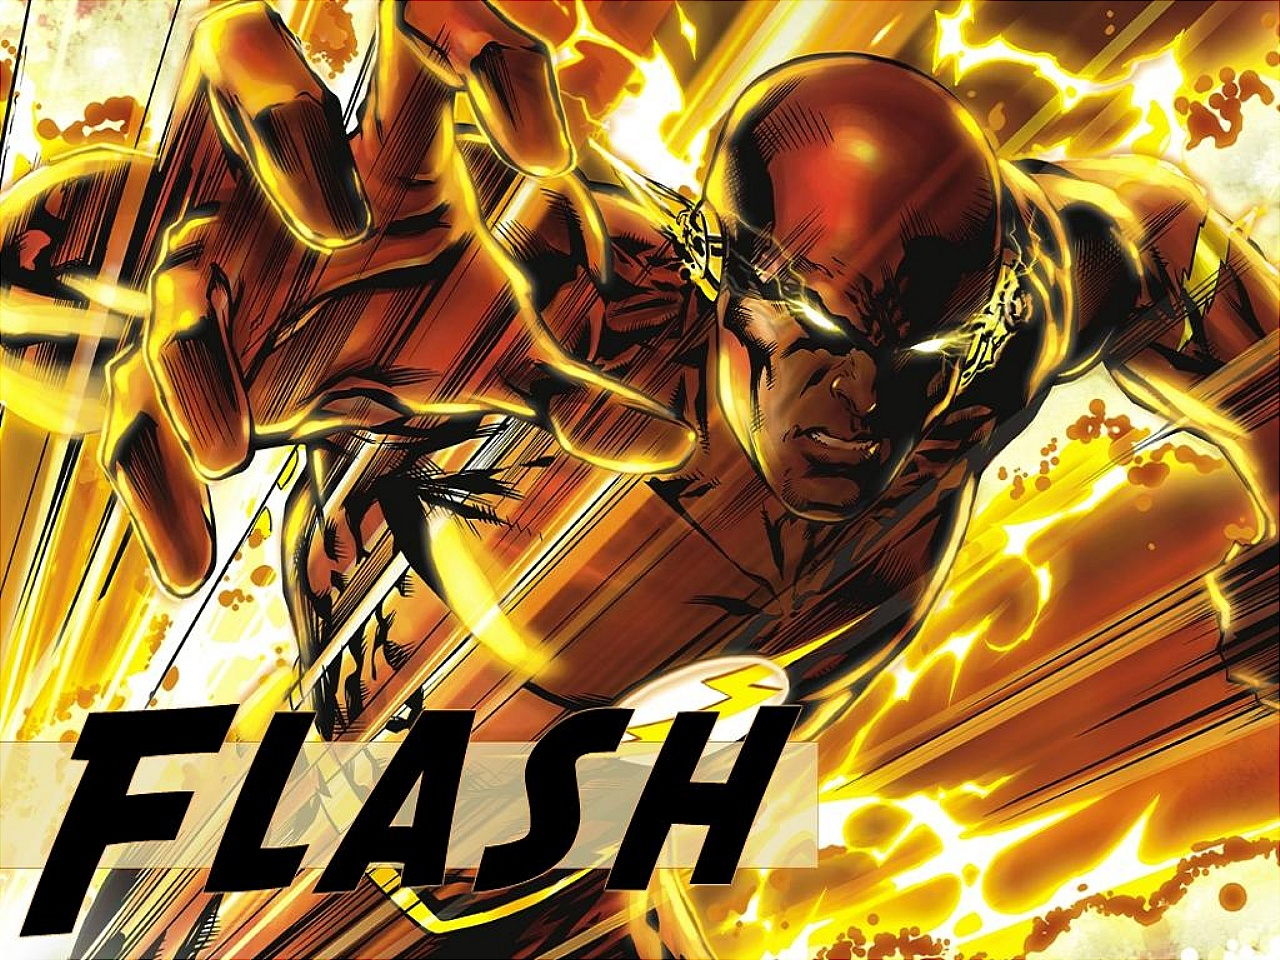 The Flash 1   Comics Photography Desktop Wallpapers 6650 Views 1280x960